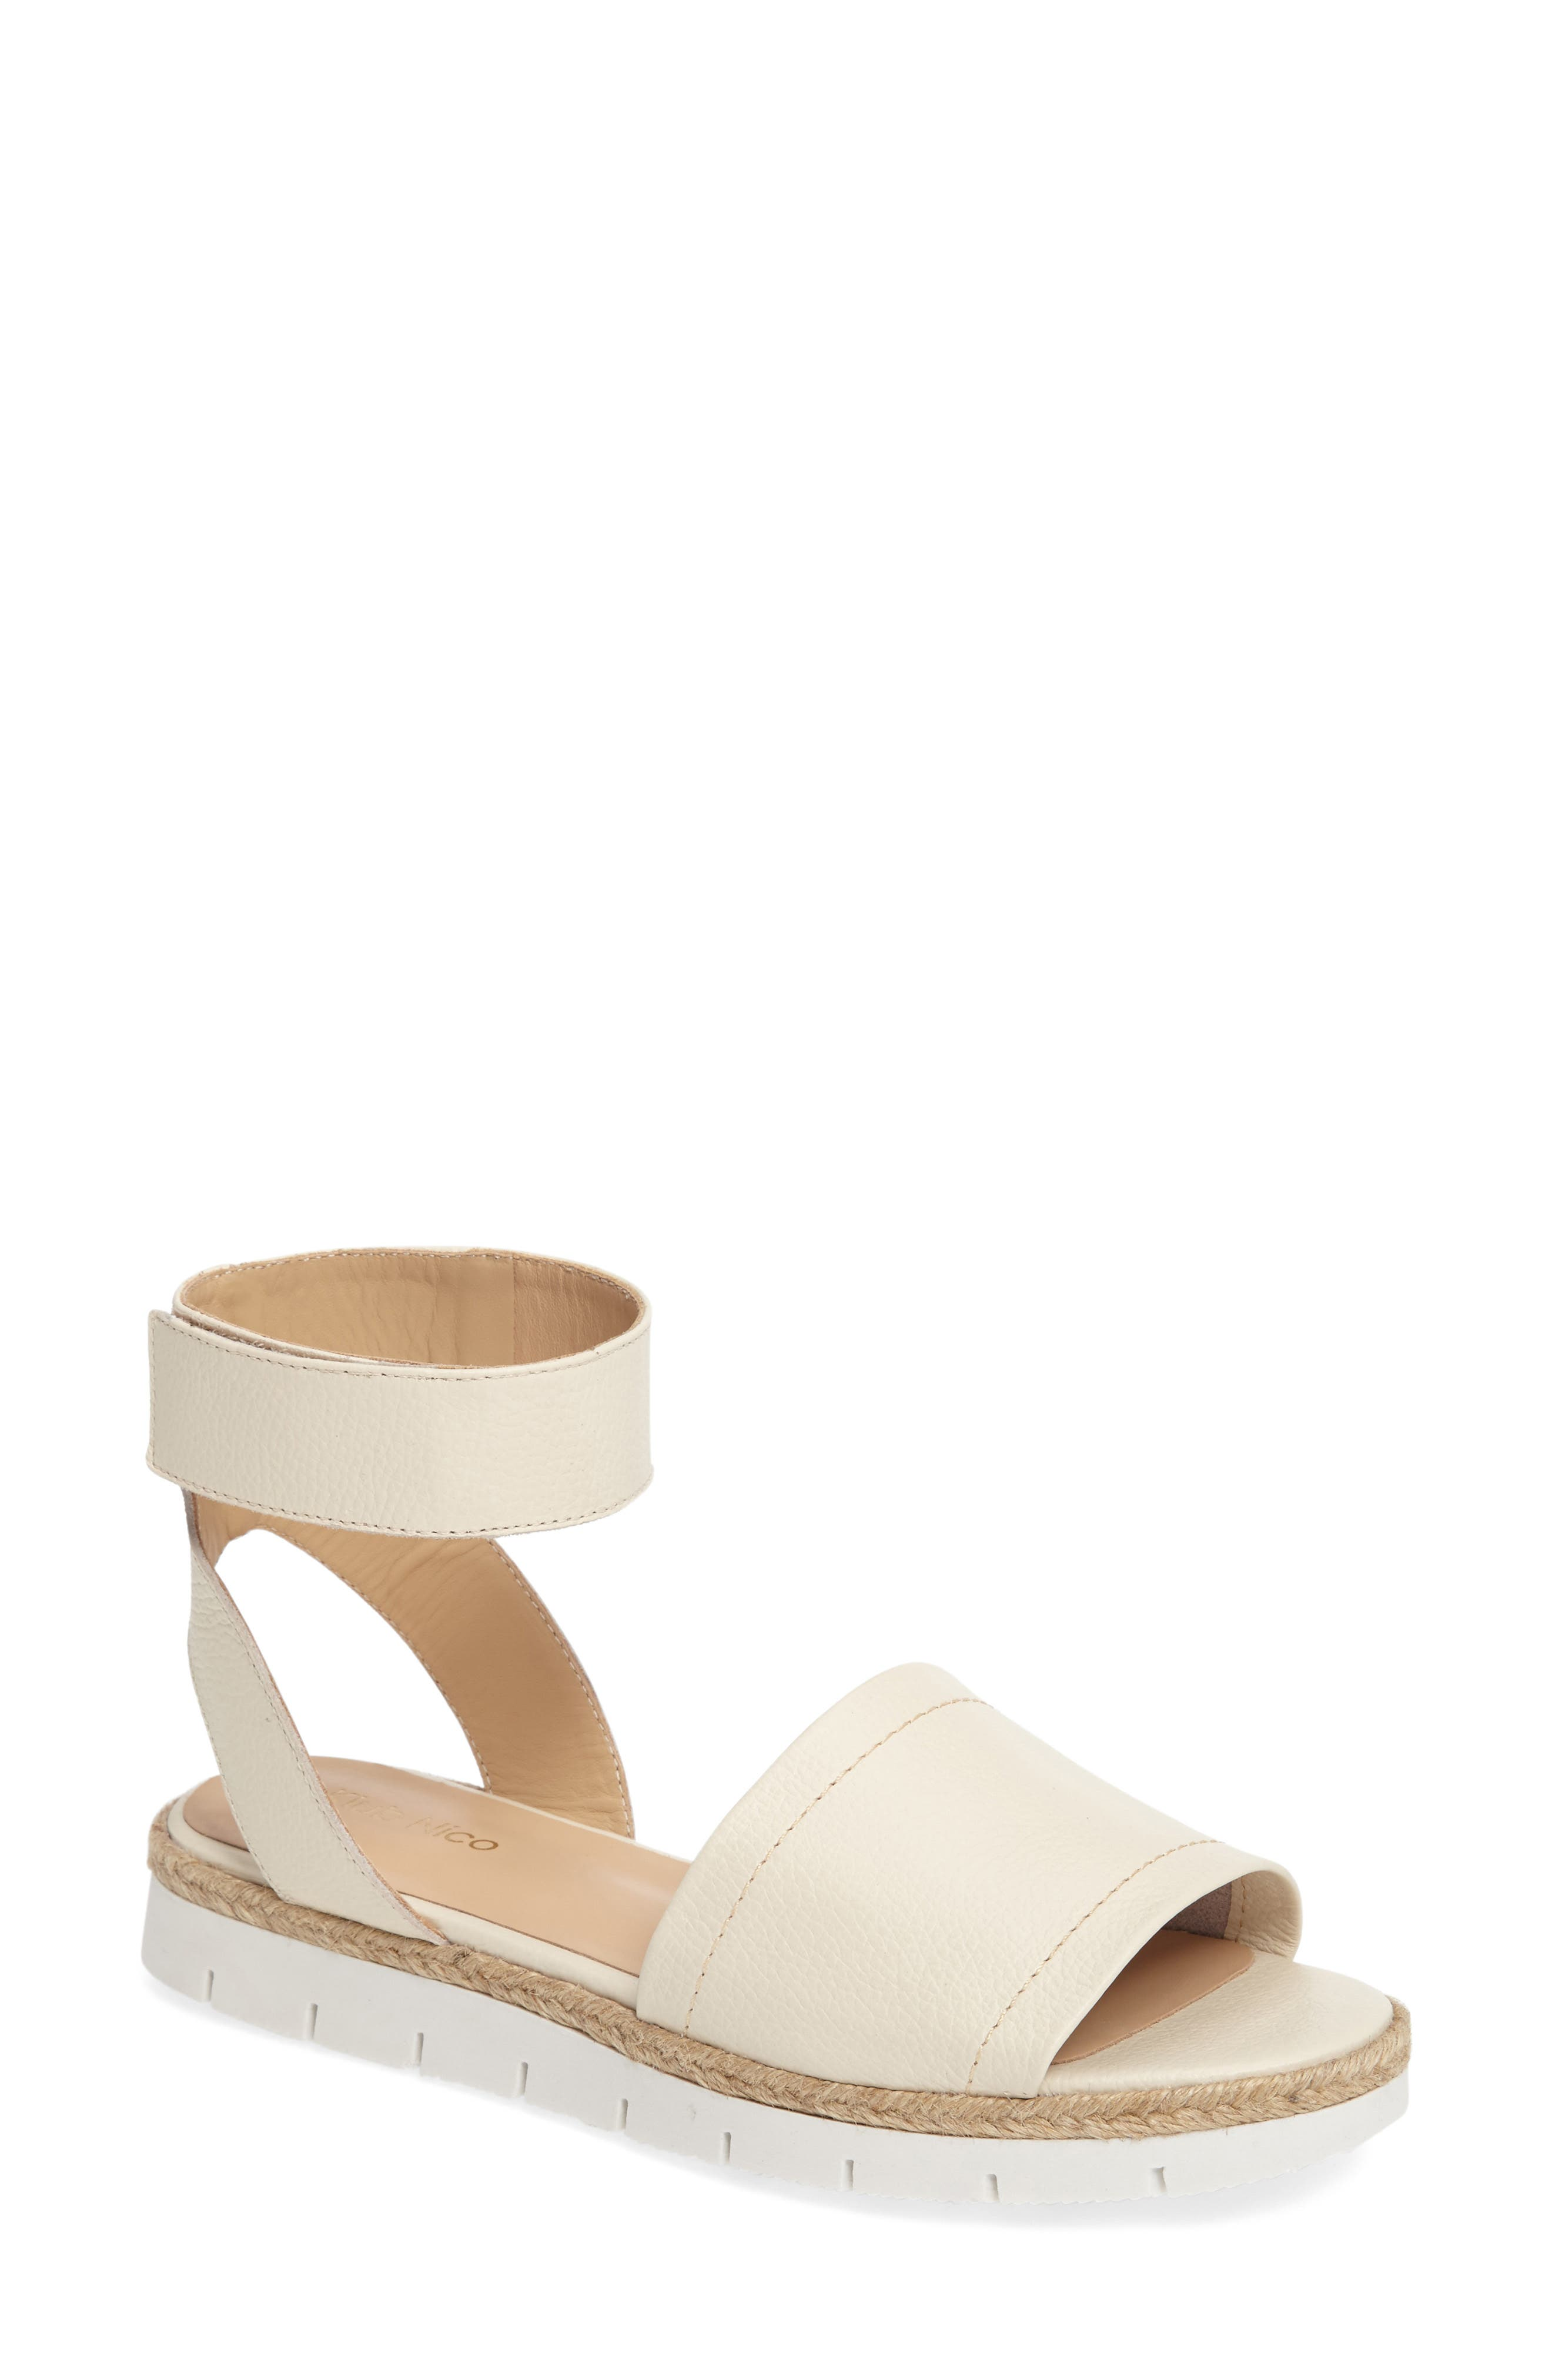 Cleo Platform Sandal,                             Main thumbnail 2, color,